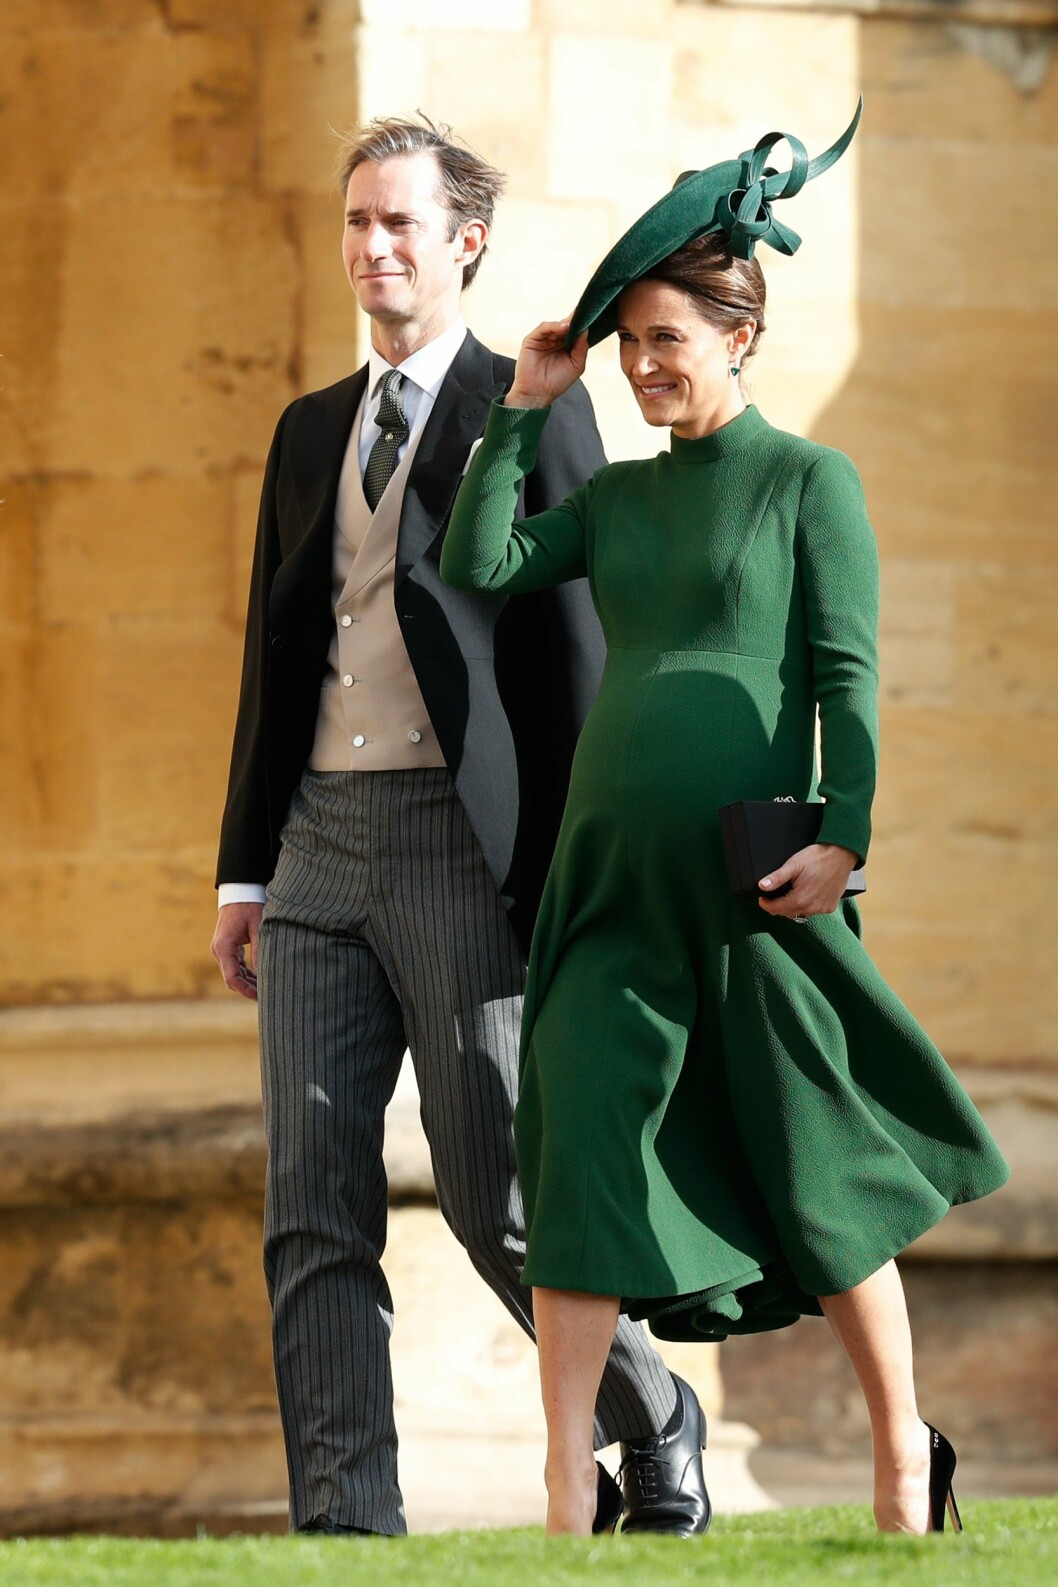 KONGELIG BRYLLUP: Hetruginne Kates gravide søster Pippa Middleton og ektemannen James Matthews. FOTO: NTB Scanpix